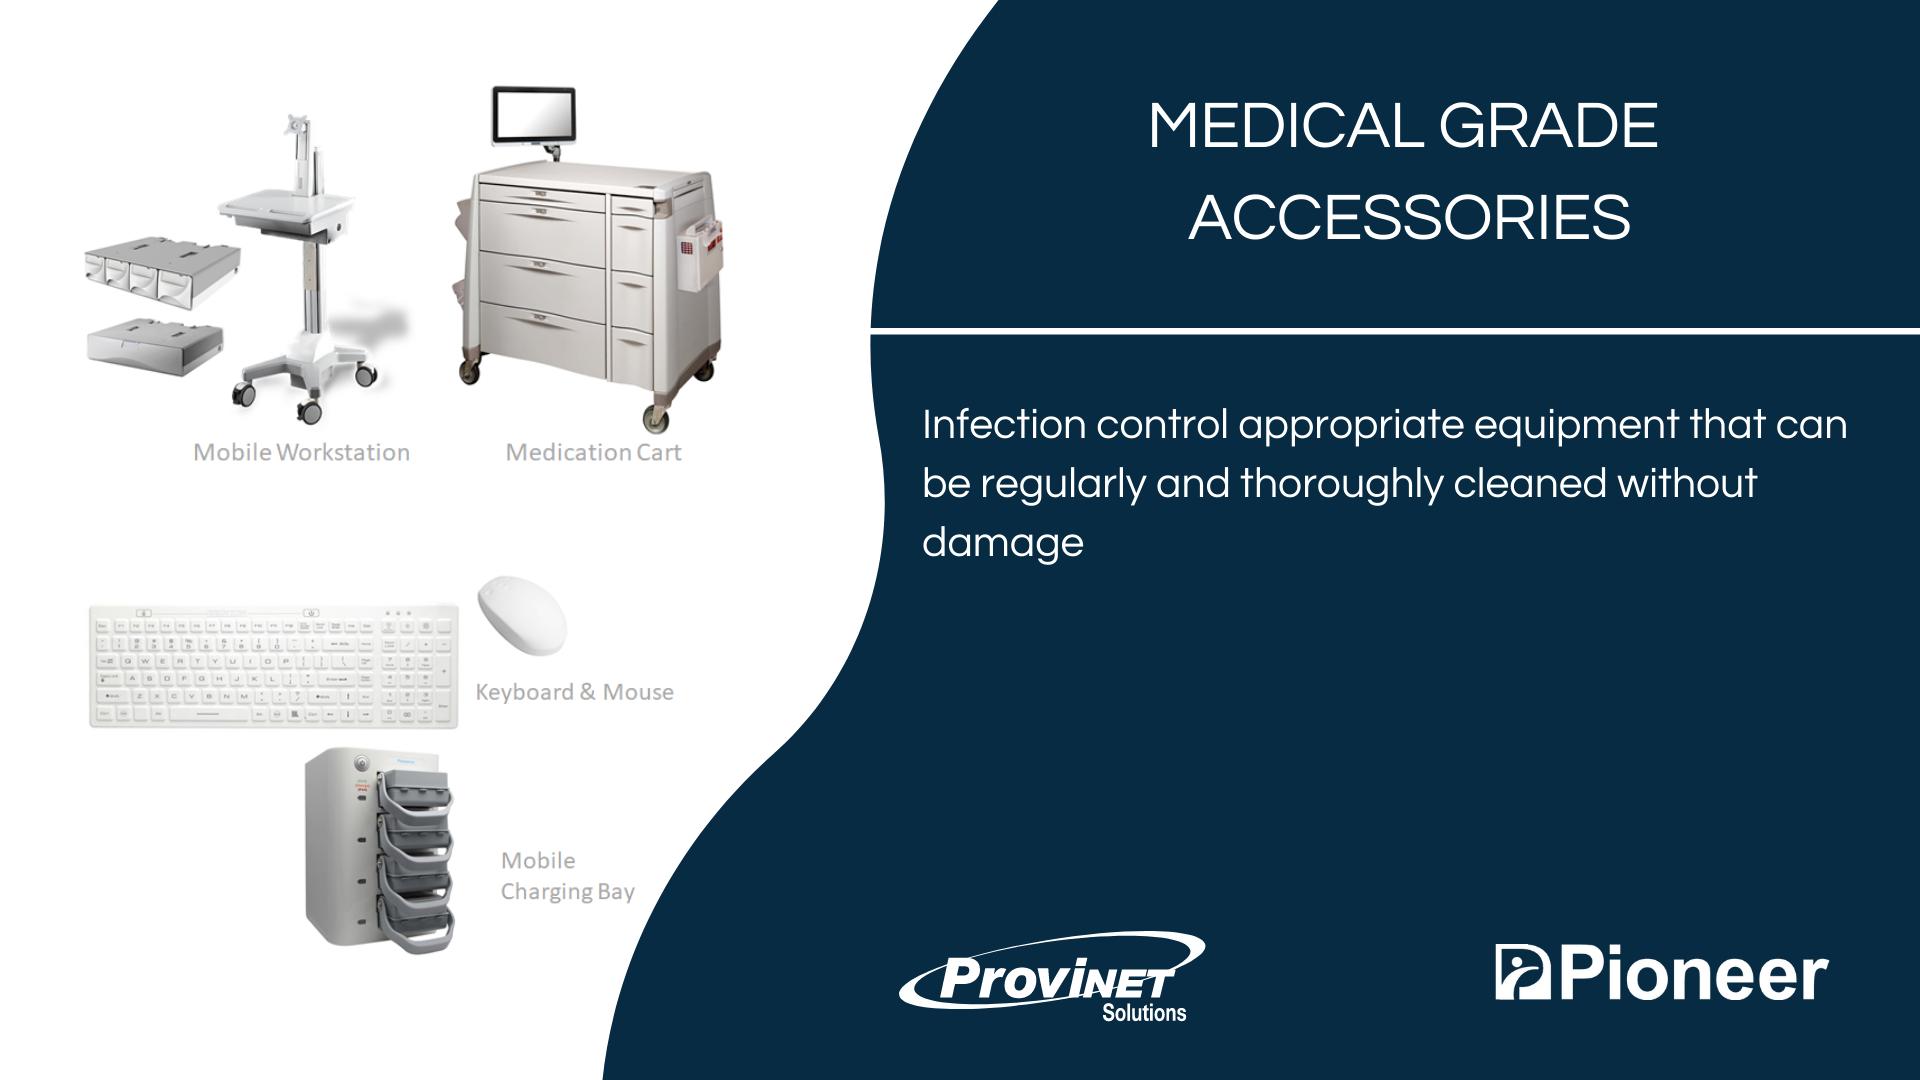 Medical Grade Accessories